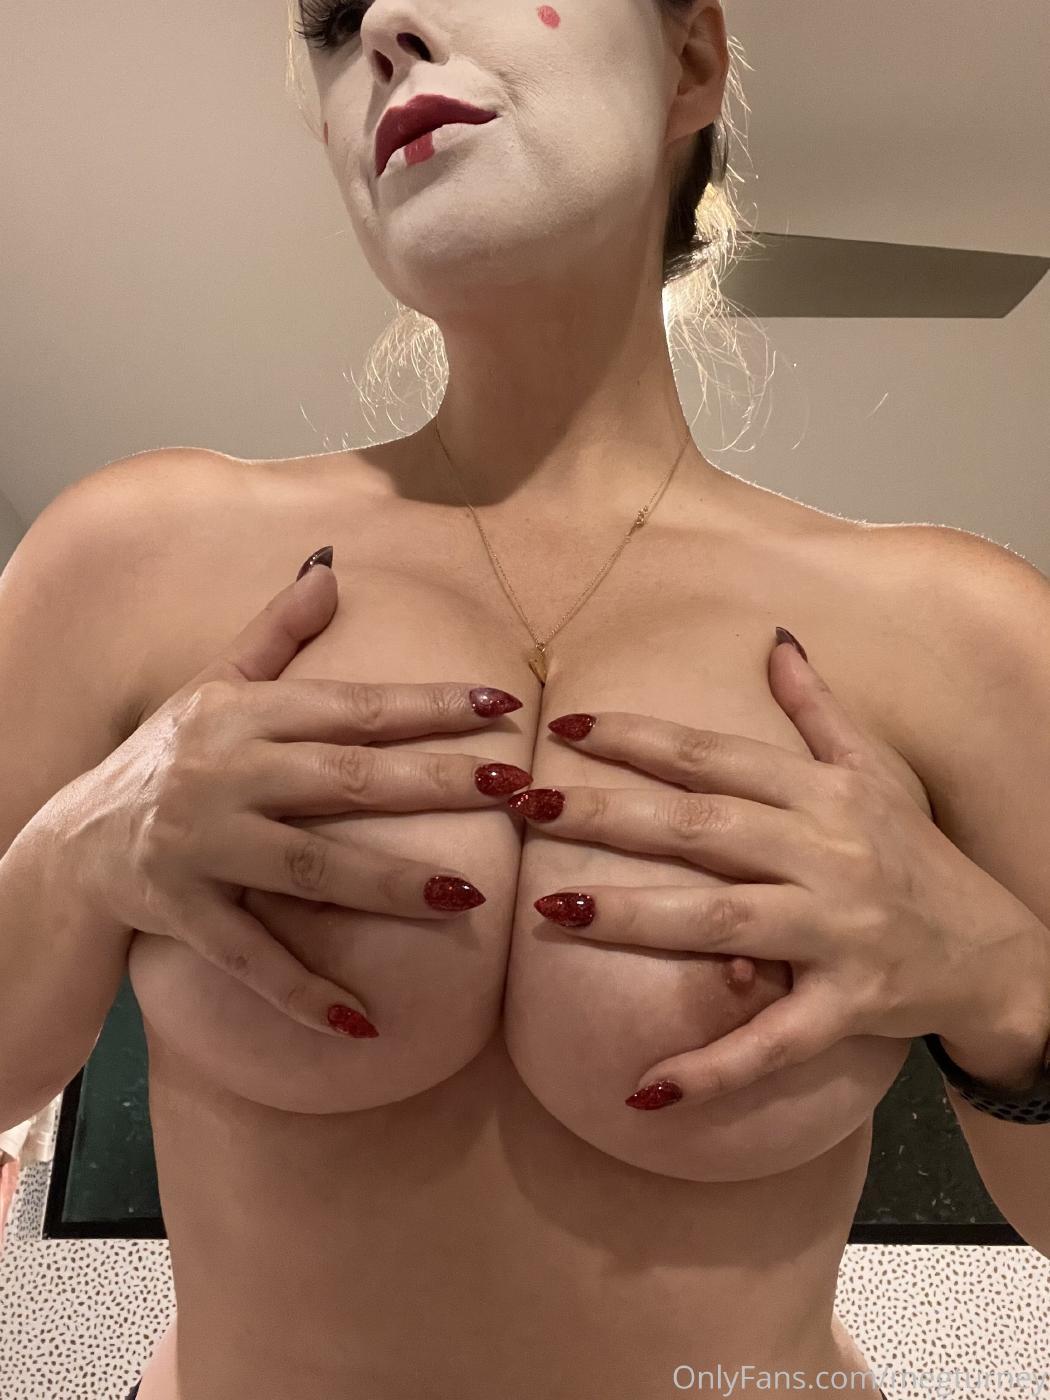 Meg Turney Topless Candids Onlyfans Set Leaked 0002